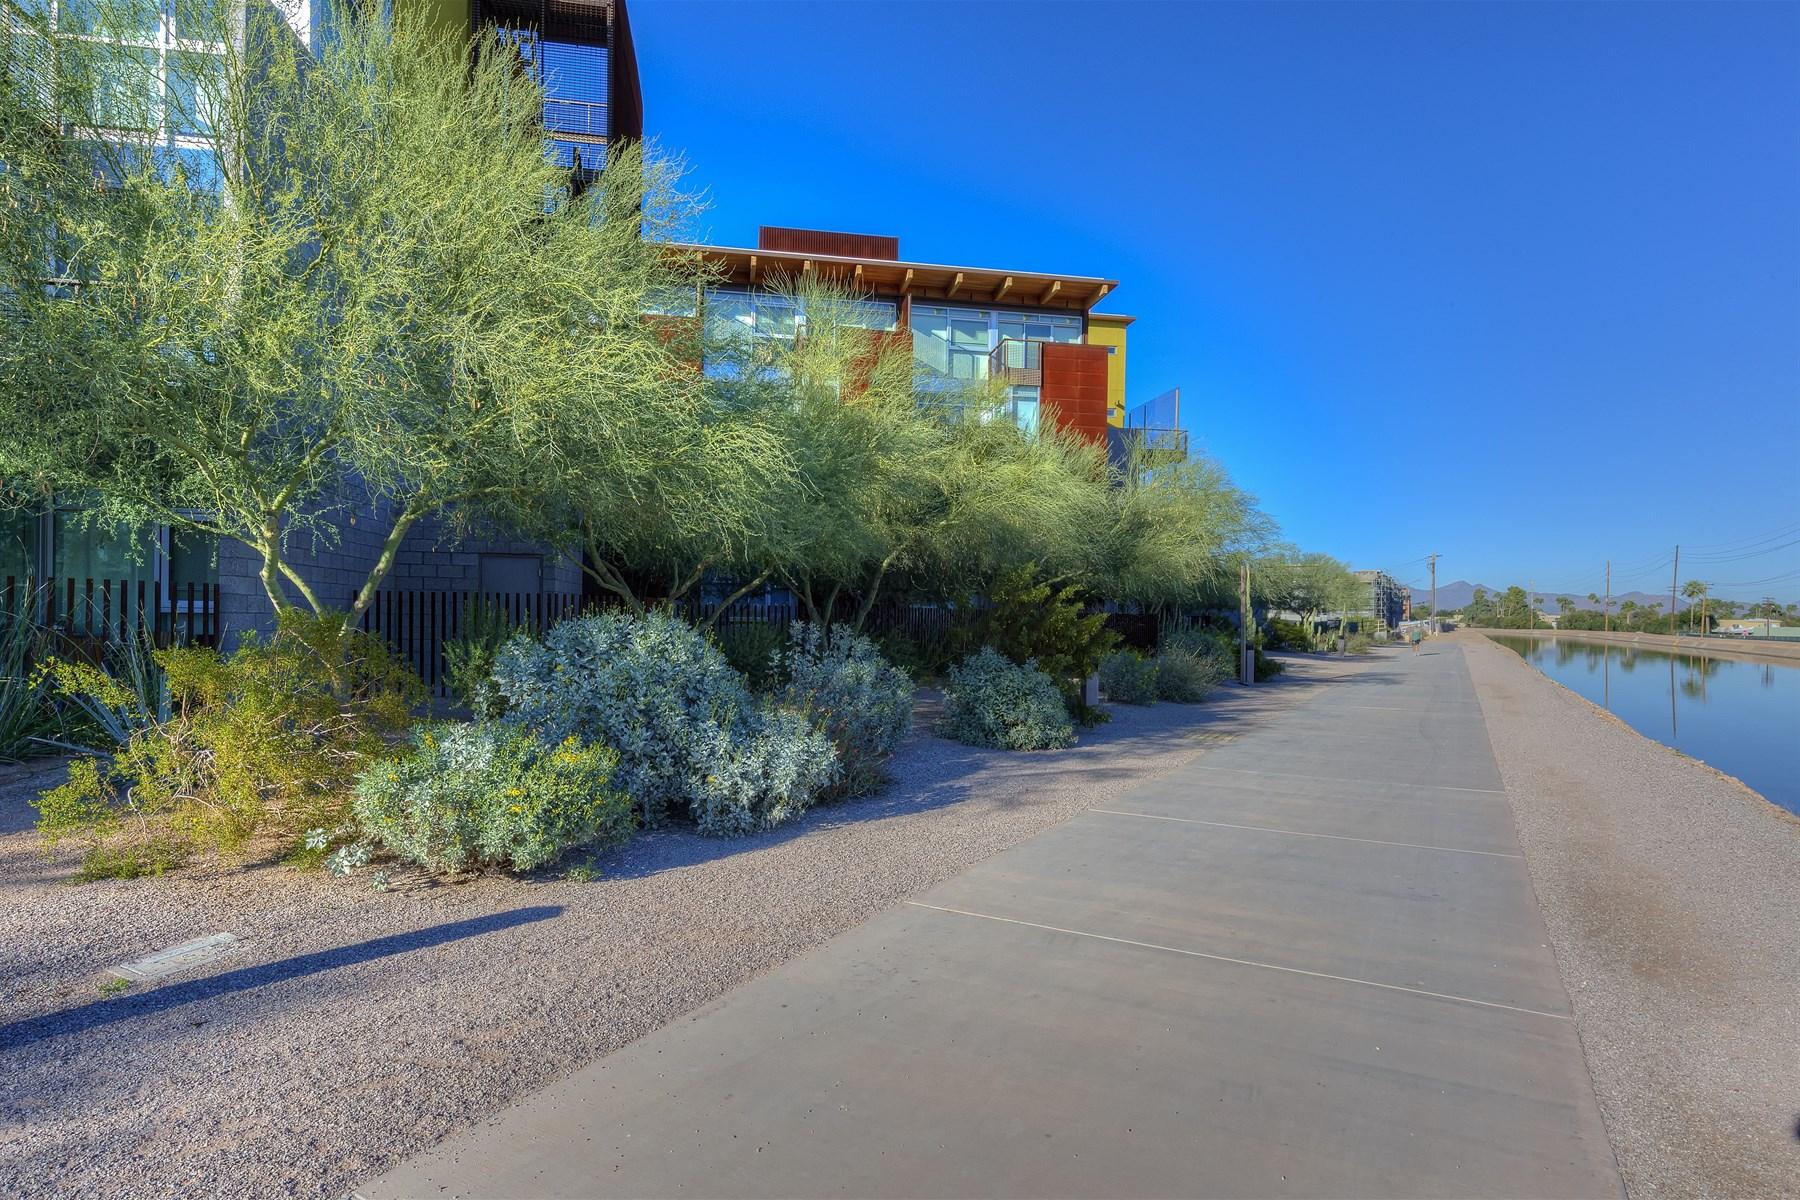 Residência urbana para Venda às Two-Story Modern And Edgy End-Unit Is On The Top Floor Of Safari Drive 4745 N Scottsdale Rd #4001 Scottsdale, Arizona 85251 Estados Unidos